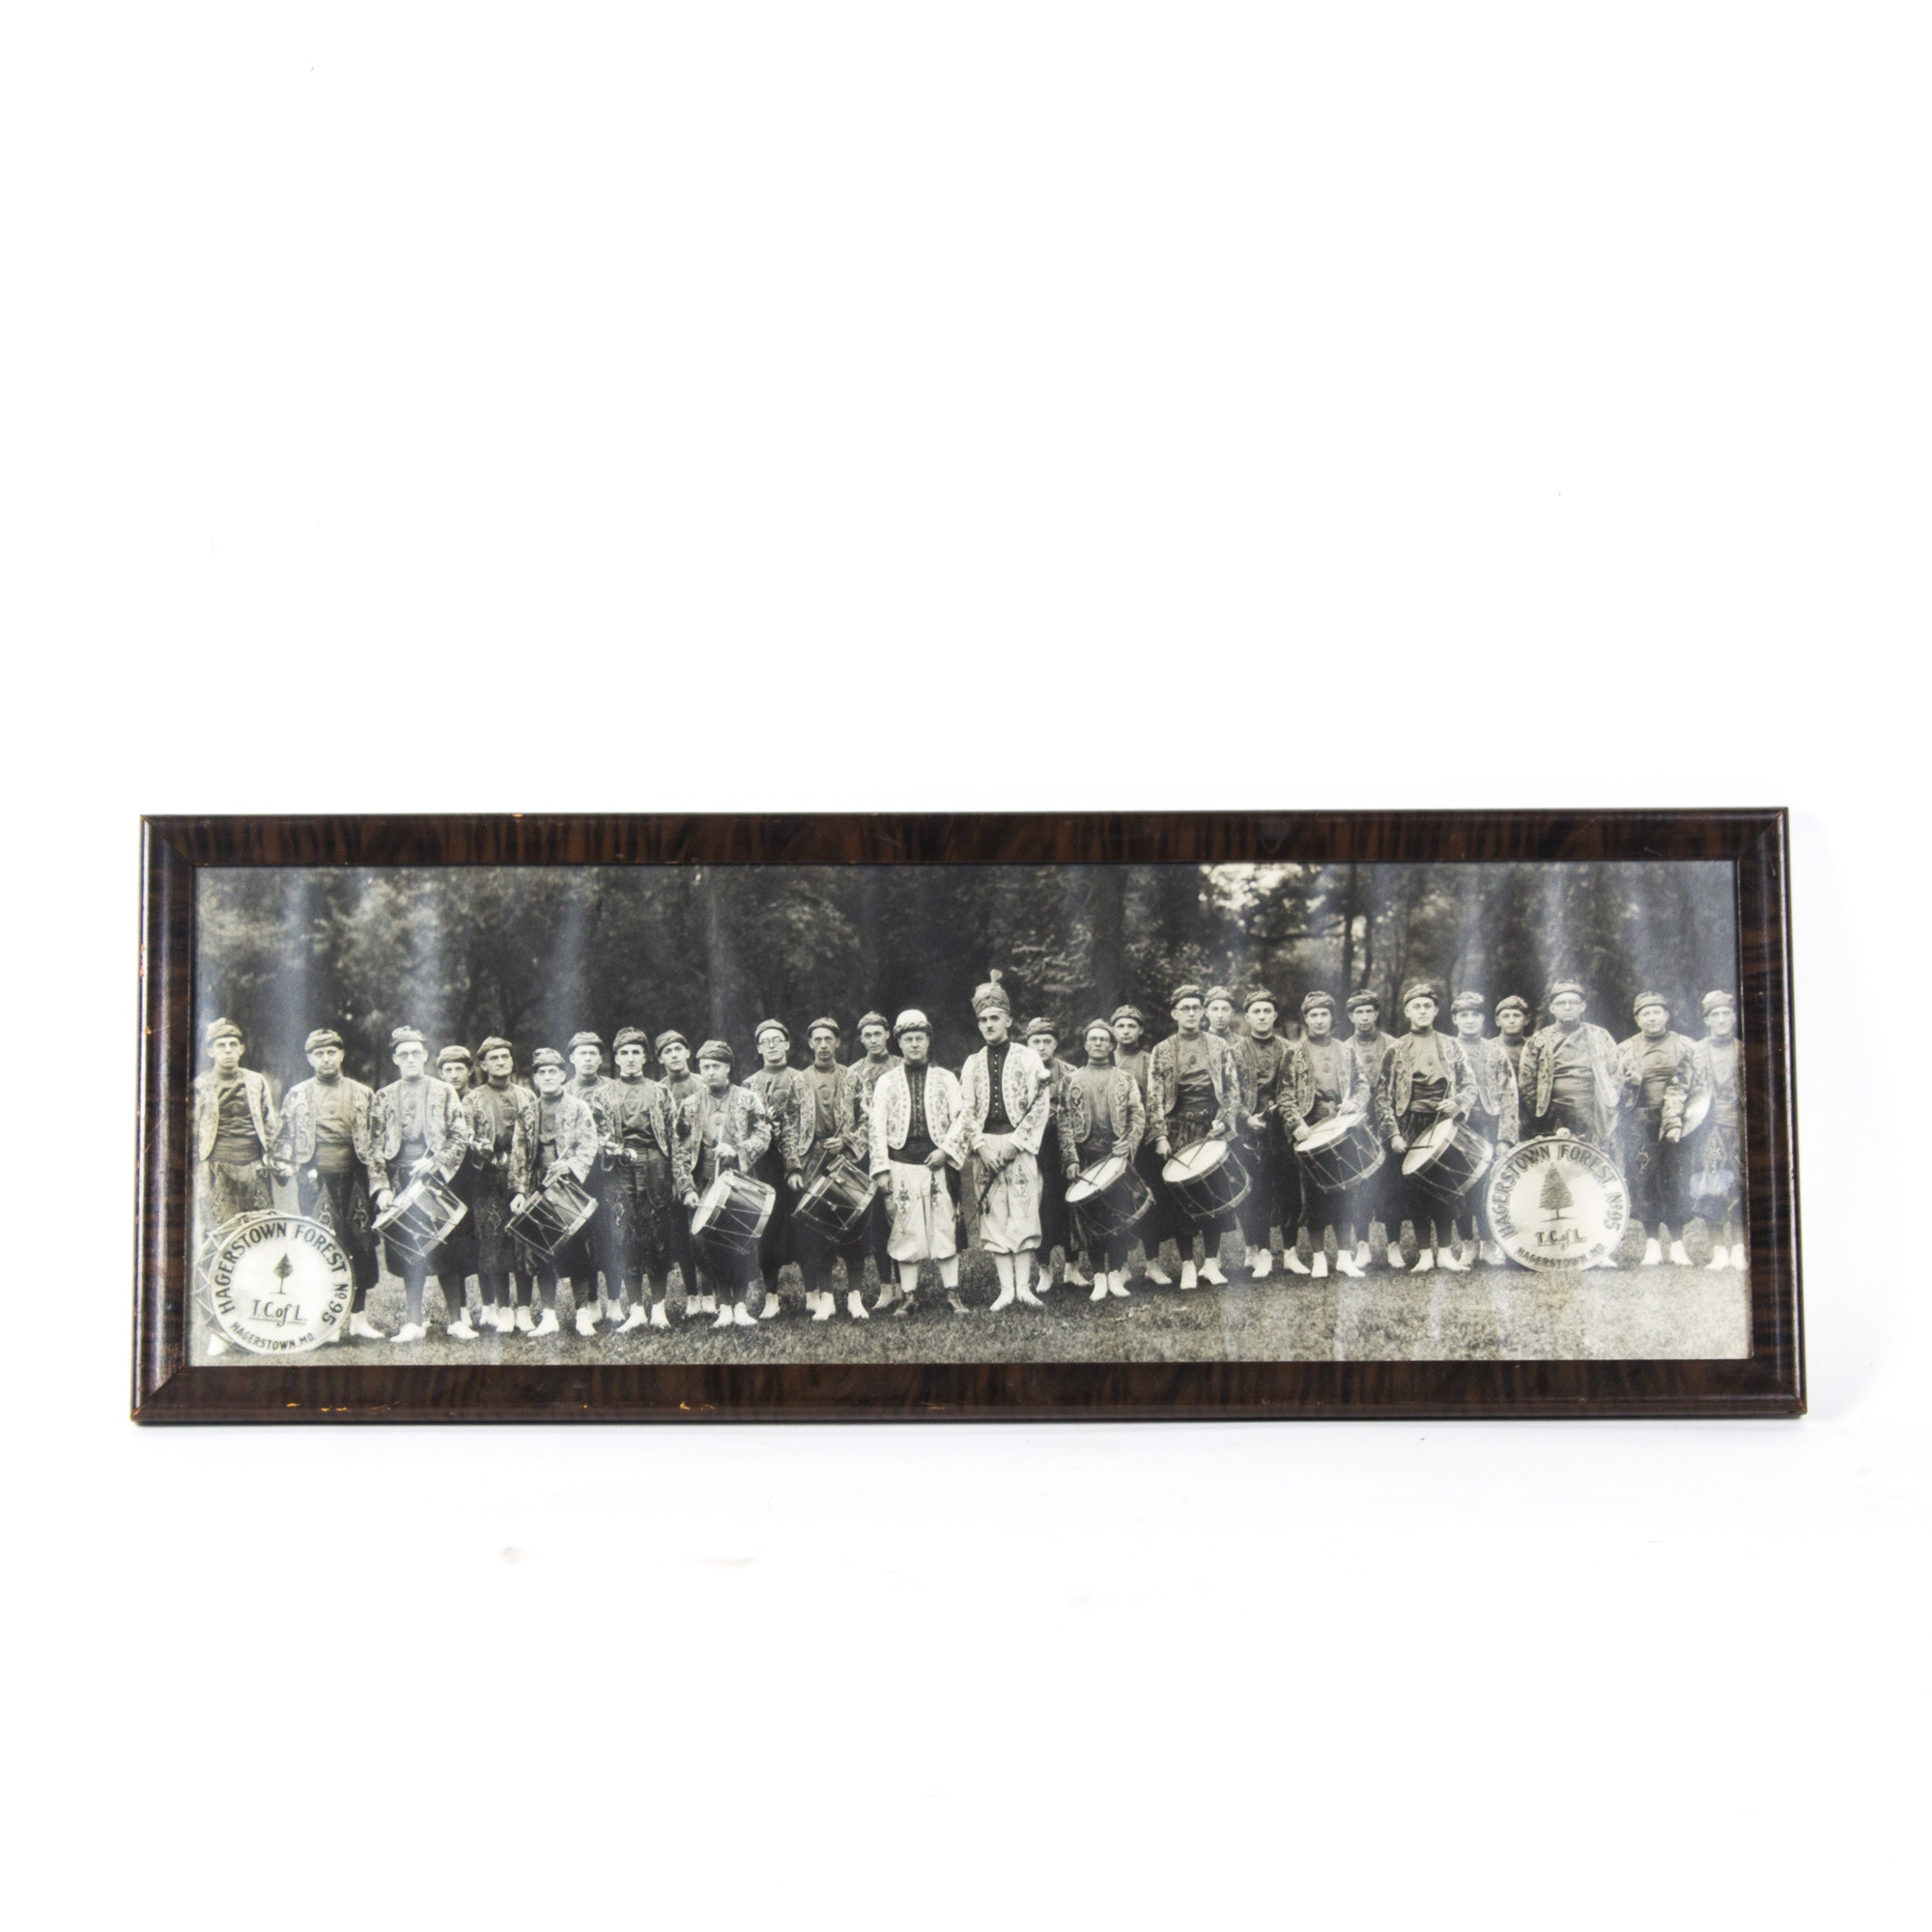 Vintage Framed Black and White Photograph